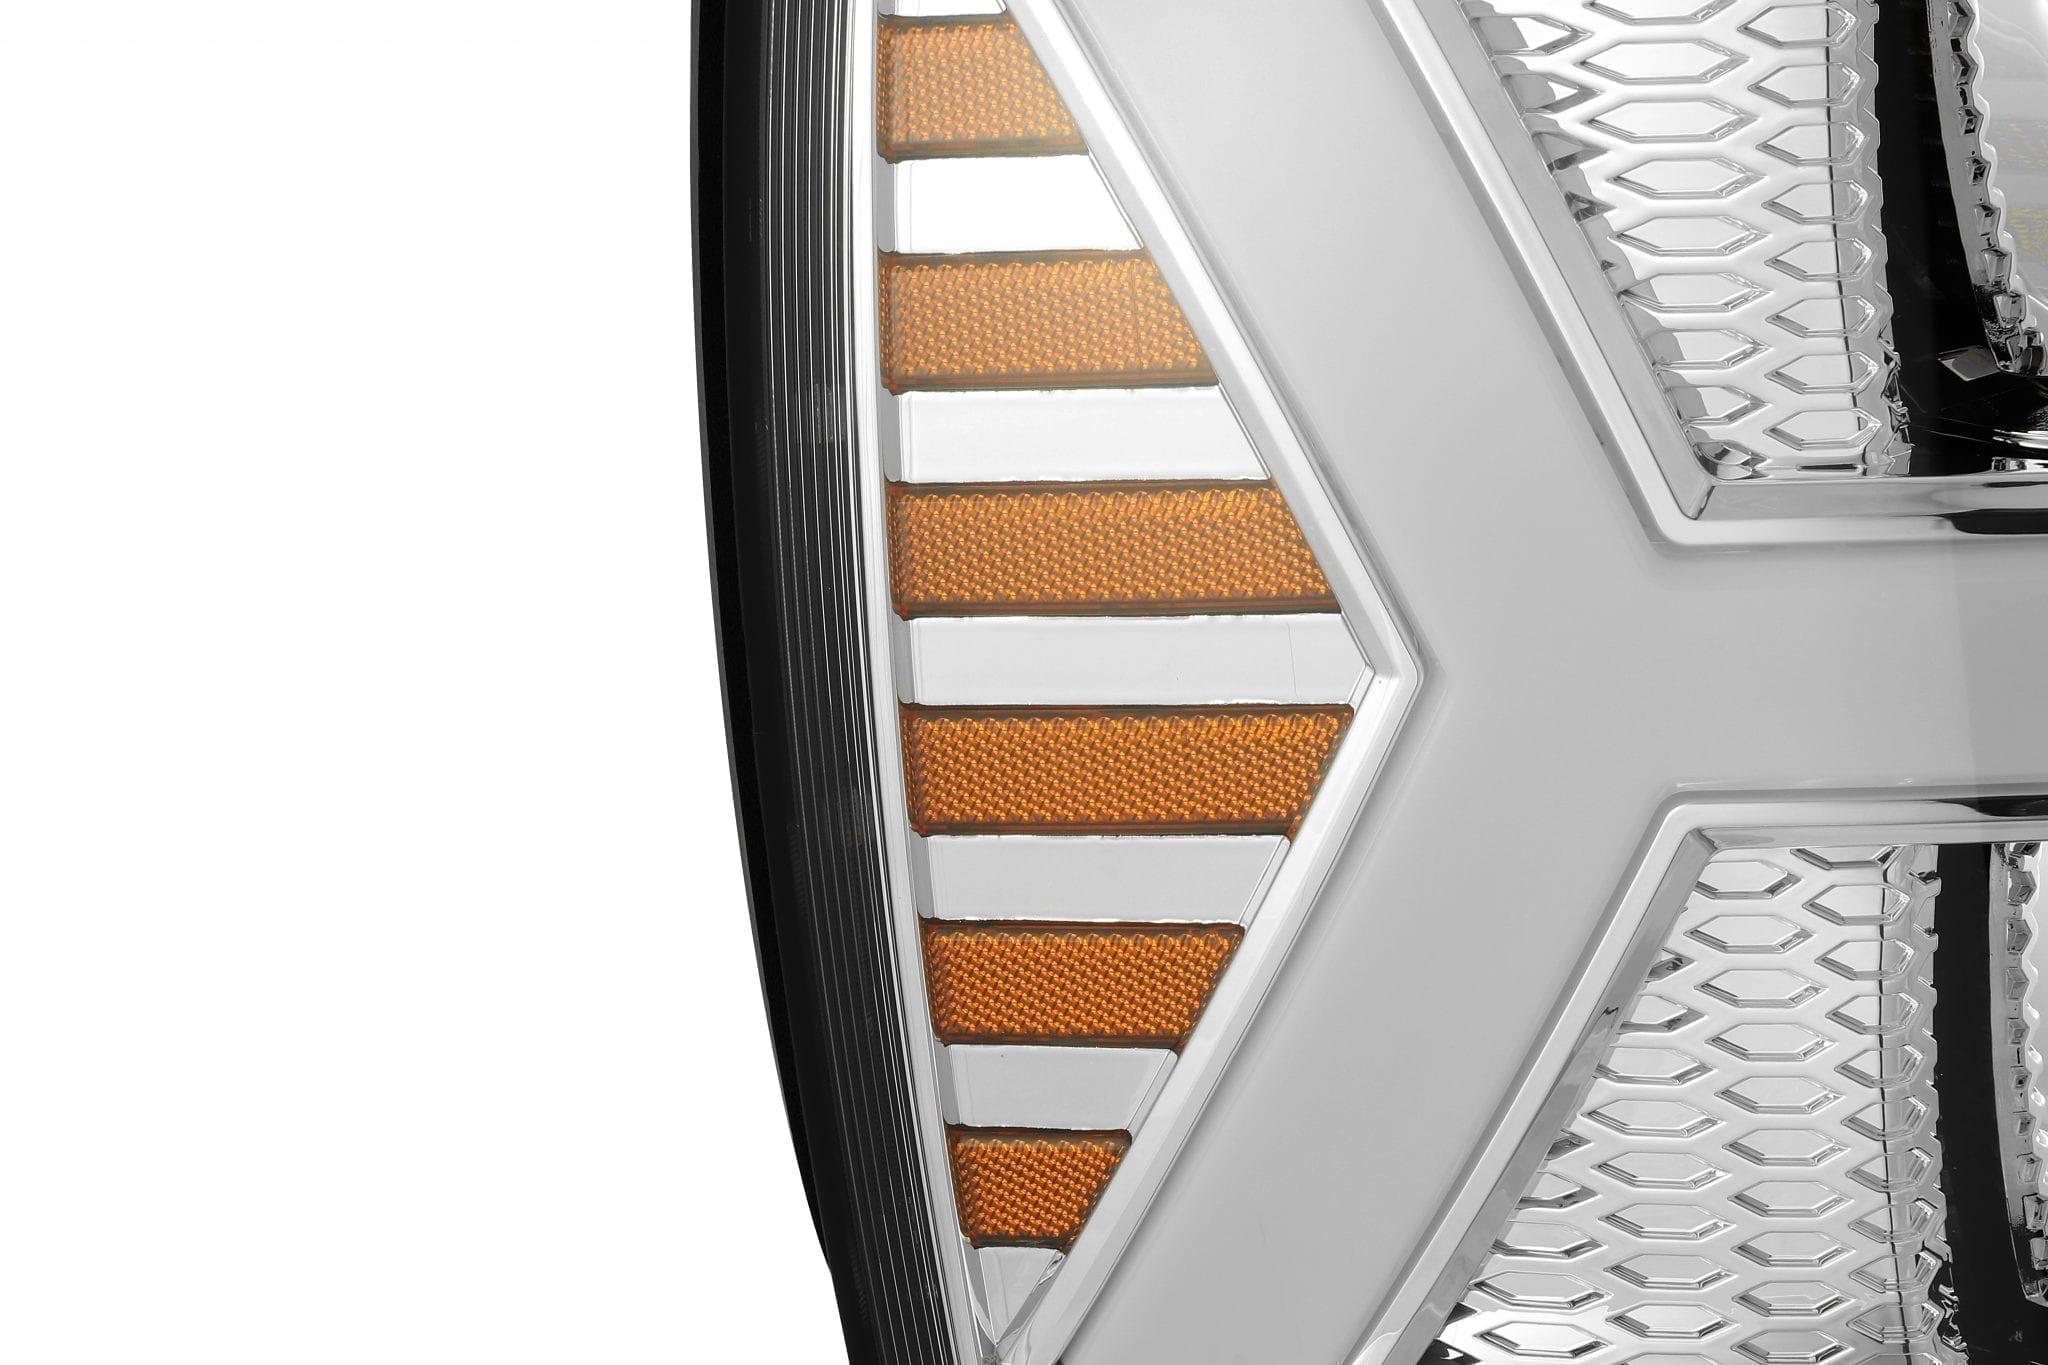 AlphaRex 2007 2008 2009 2010 2011 2012 2013 Chevrolet Silverado NOVA-Series Full LED Projector Headlights Chrome